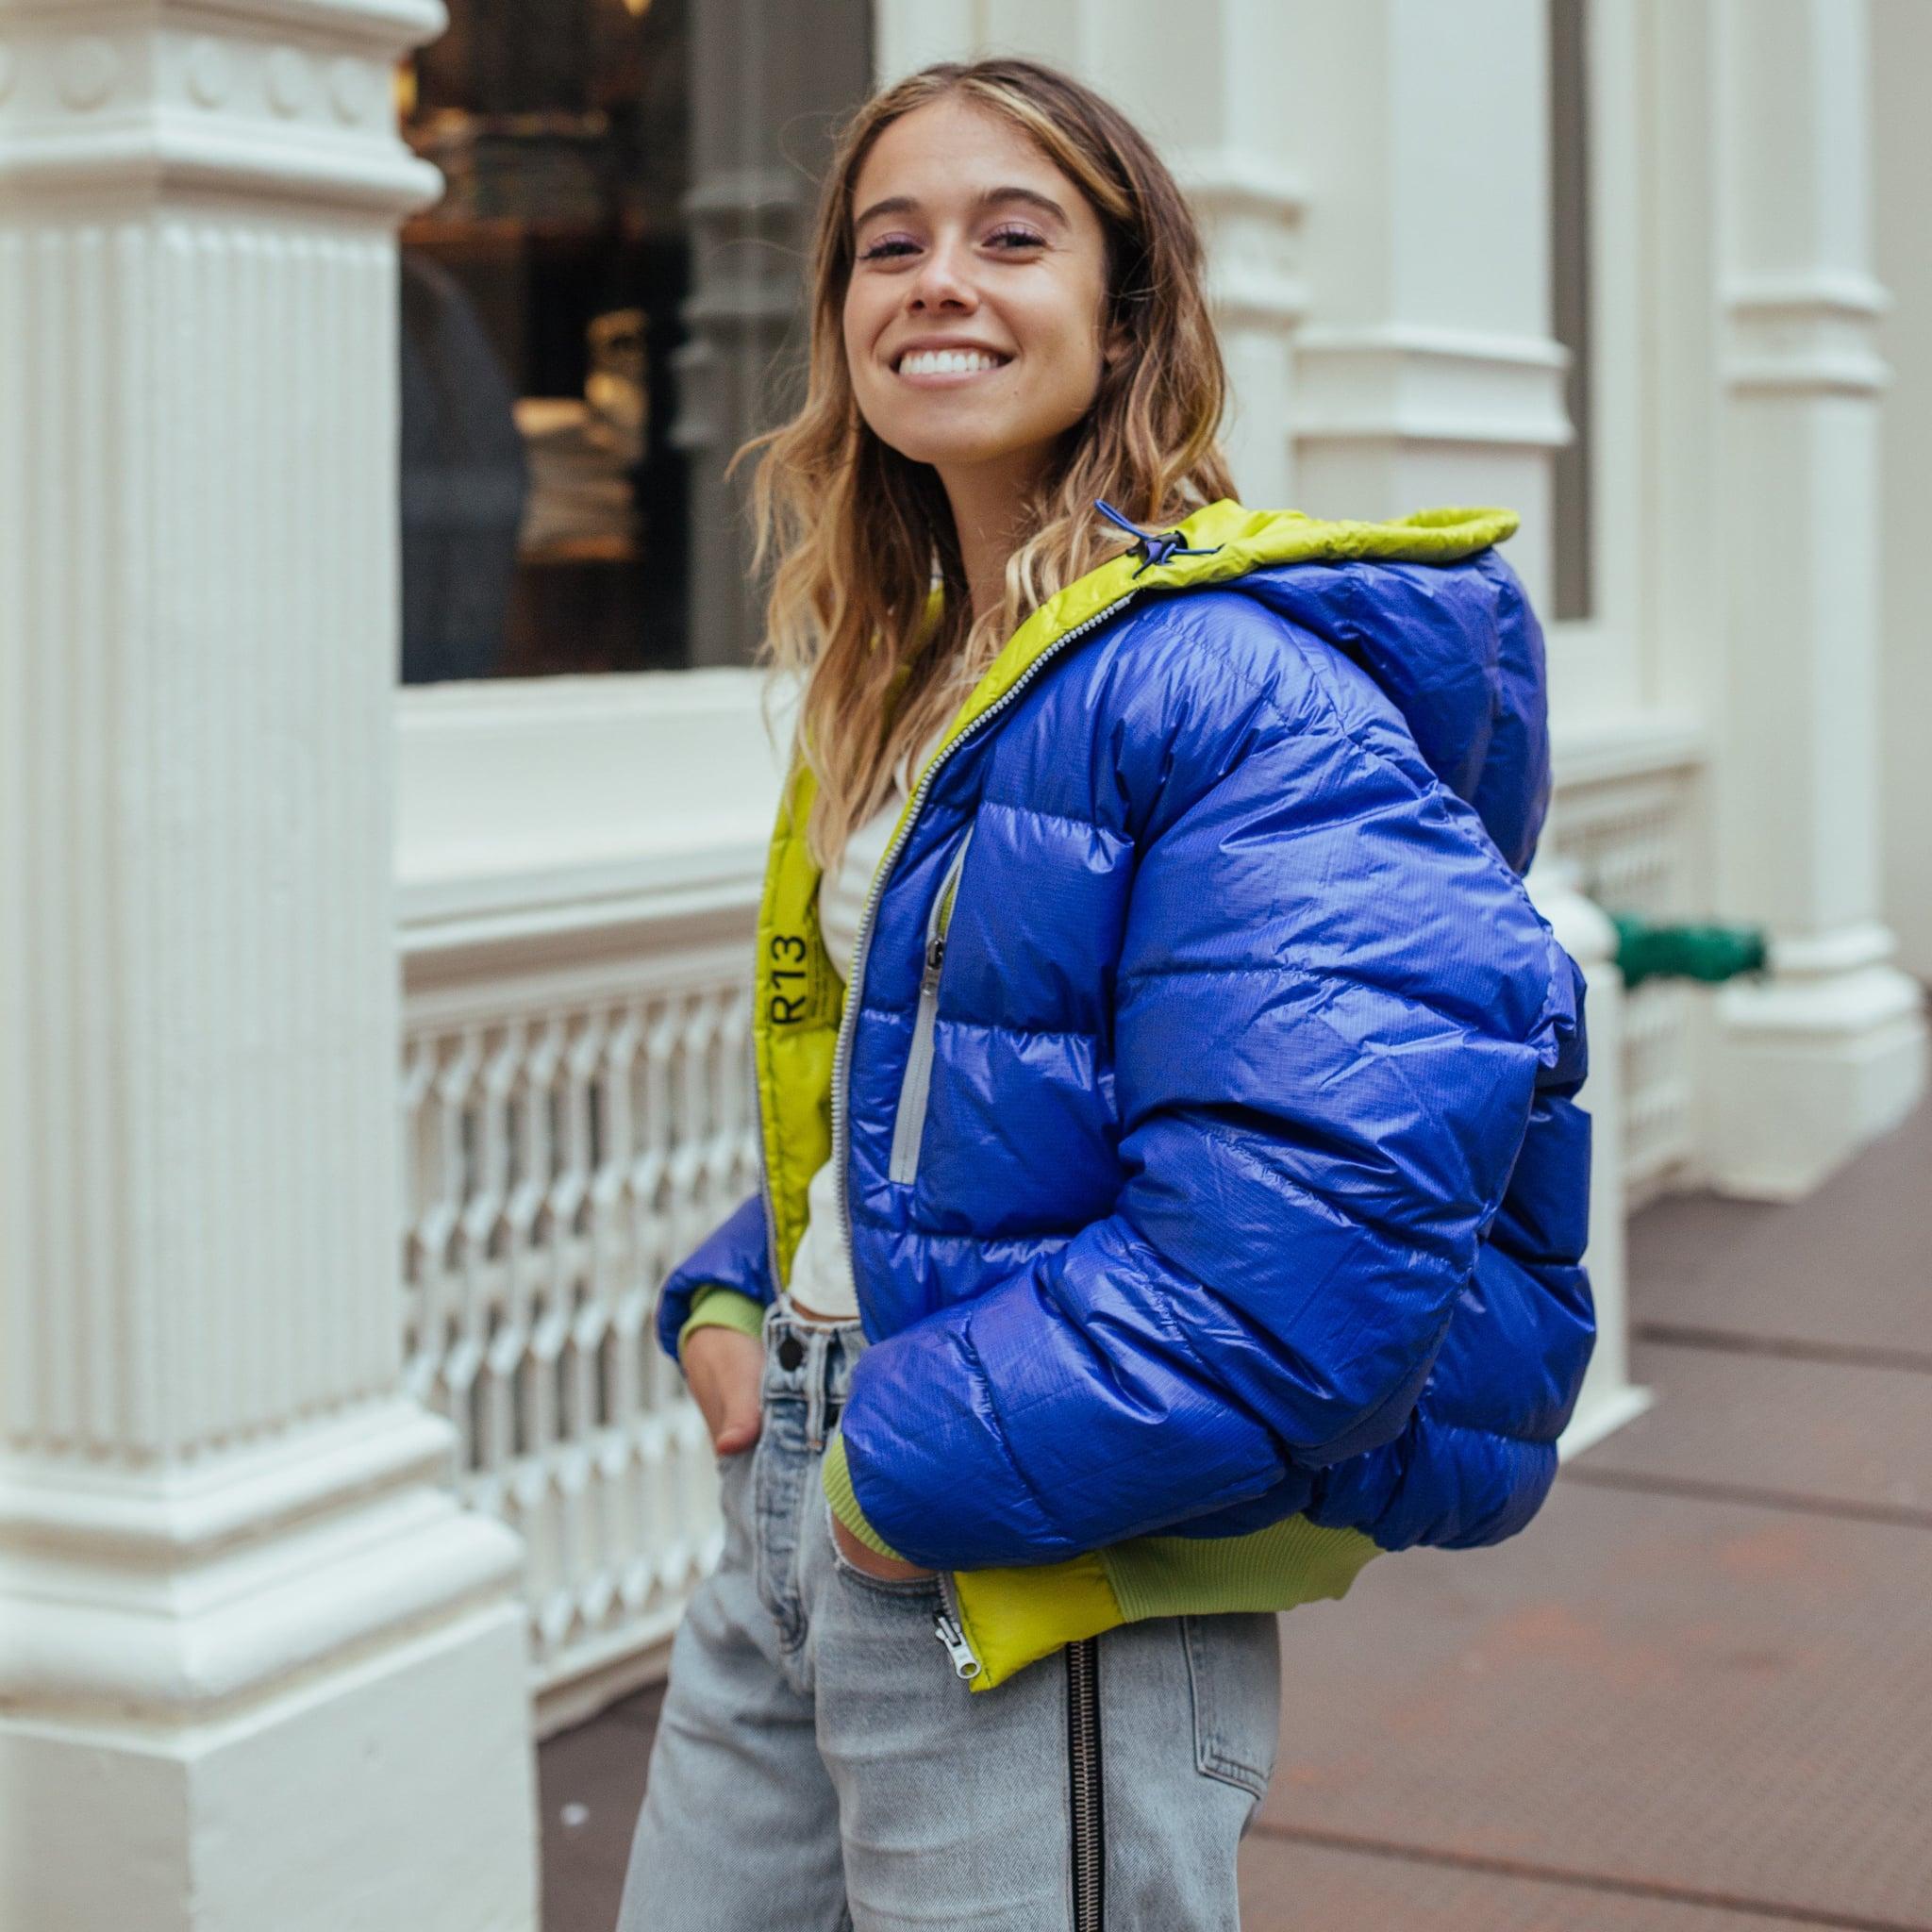 bfeb23463 Jeans Trends 2019 | POPSUGAR Fashion